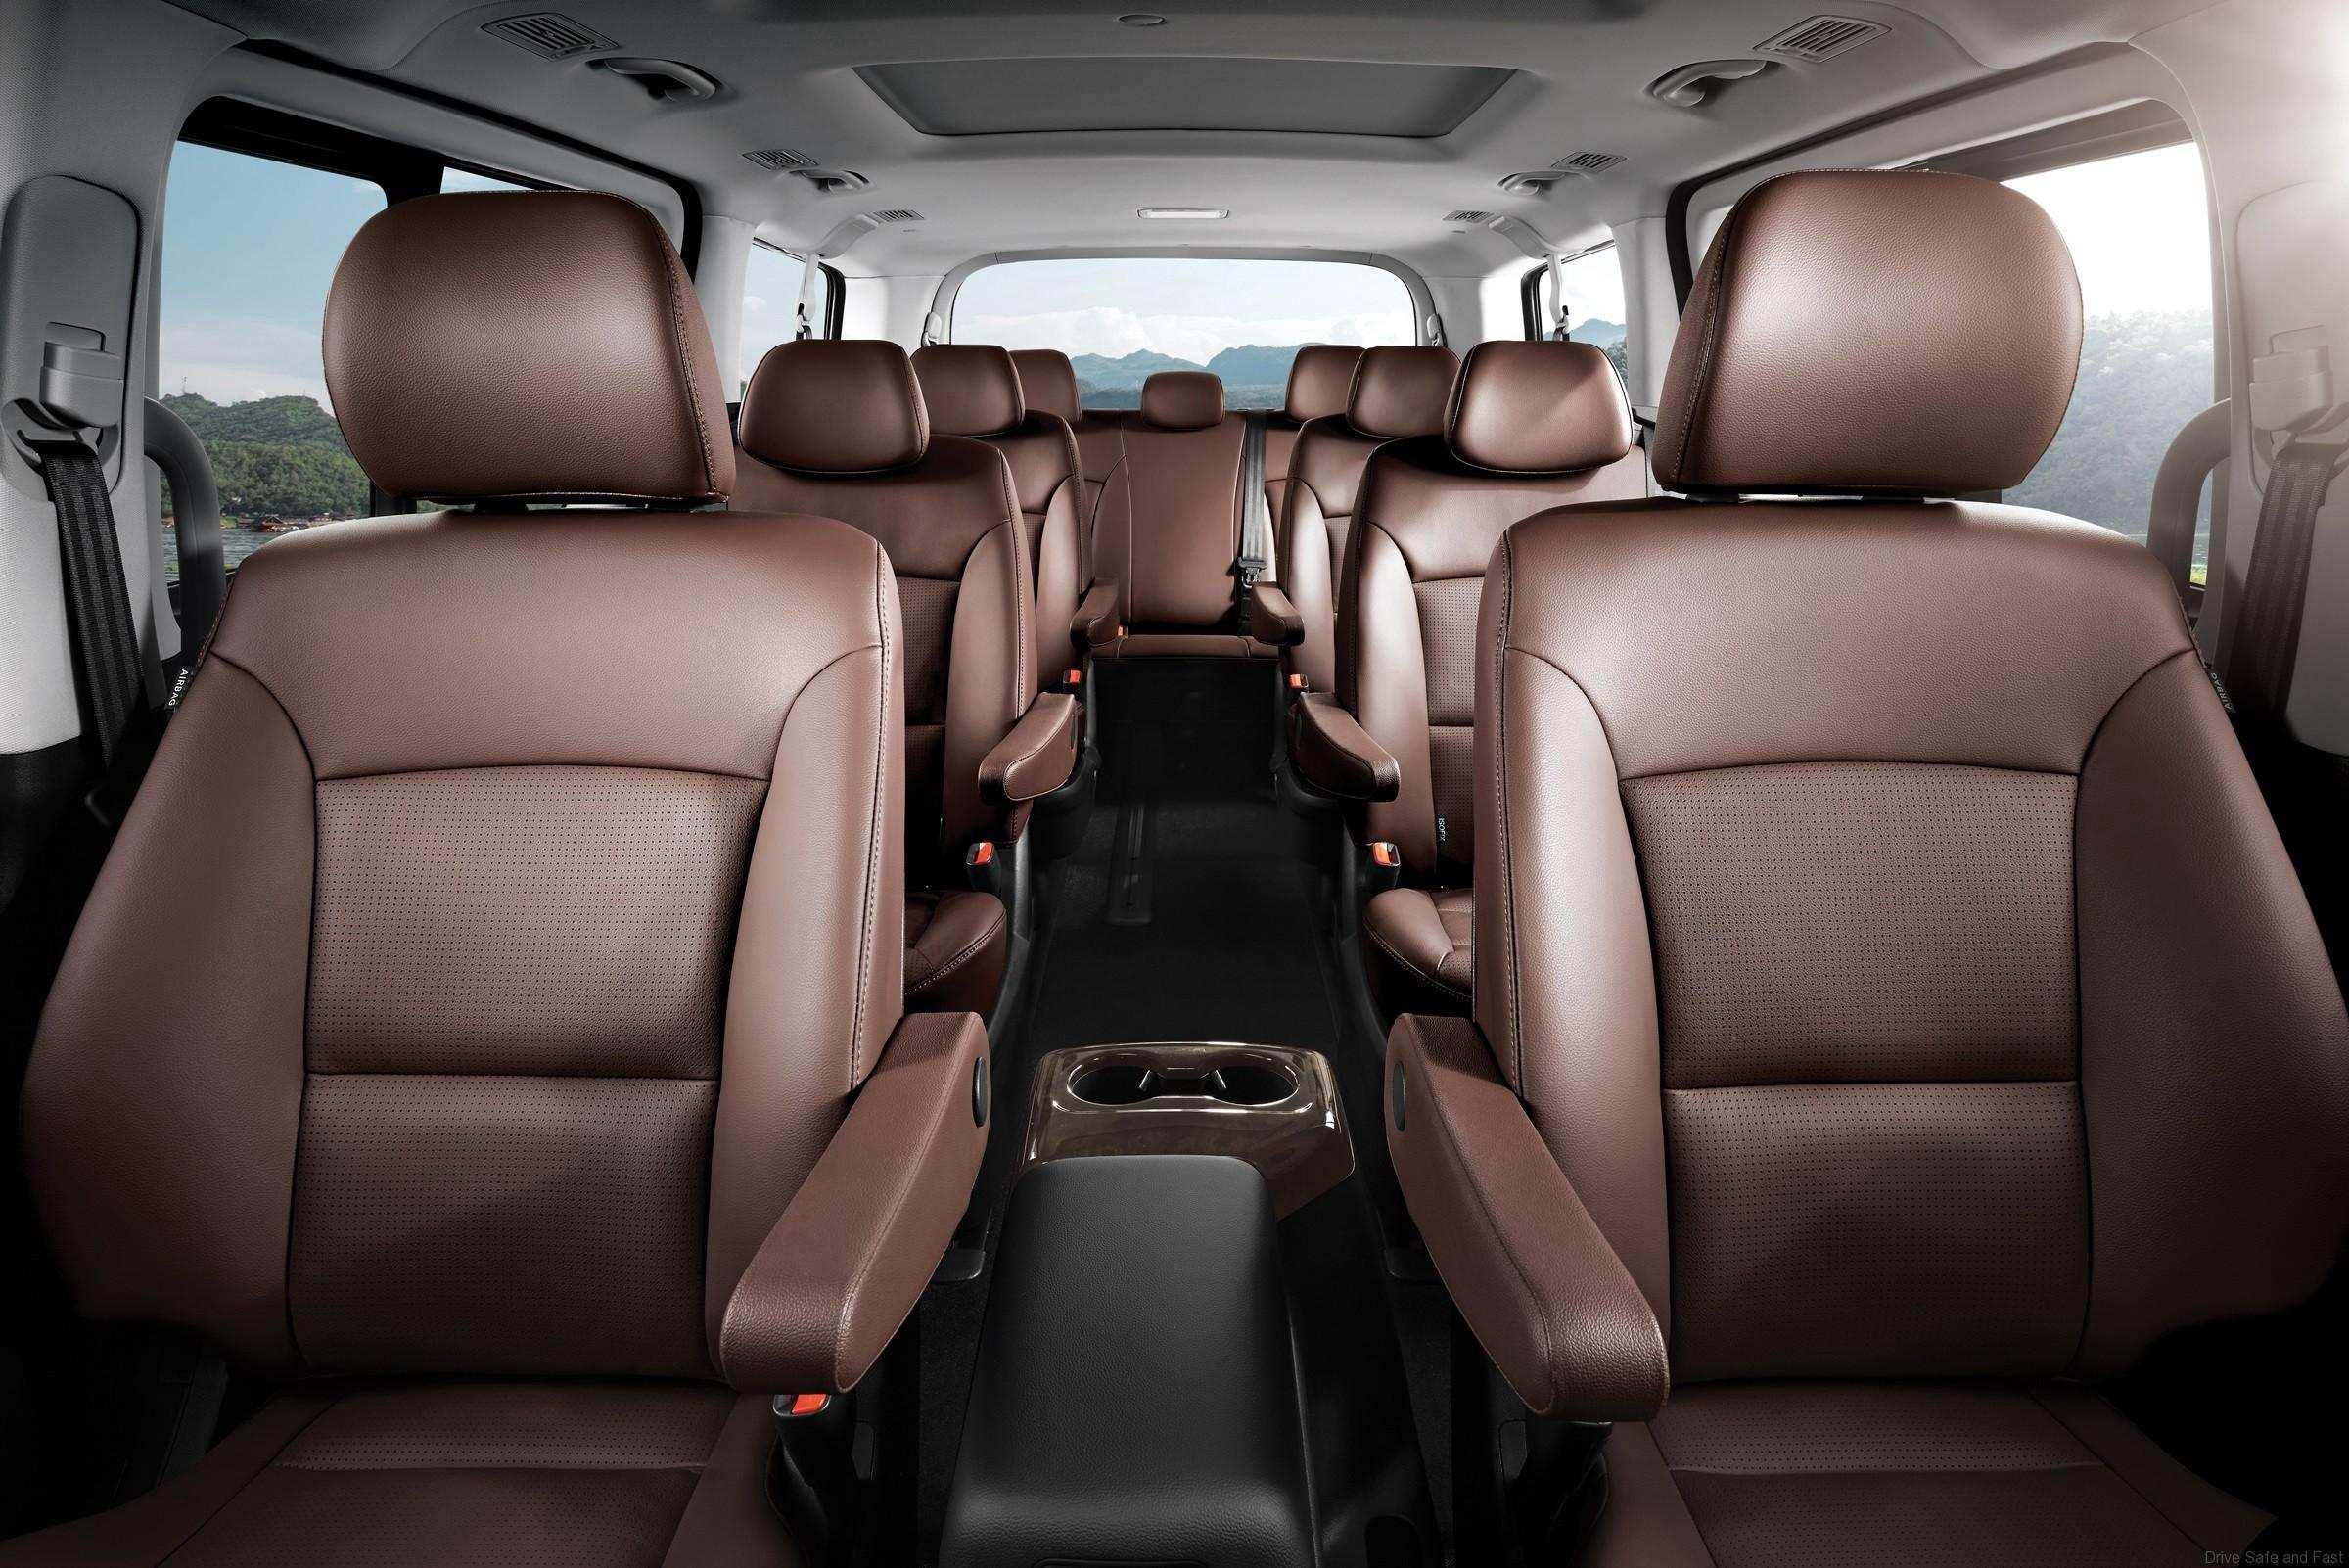 25 New 2020 Hyundai Starex 2018 First Drive for 2020 Hyundai Starex 2018